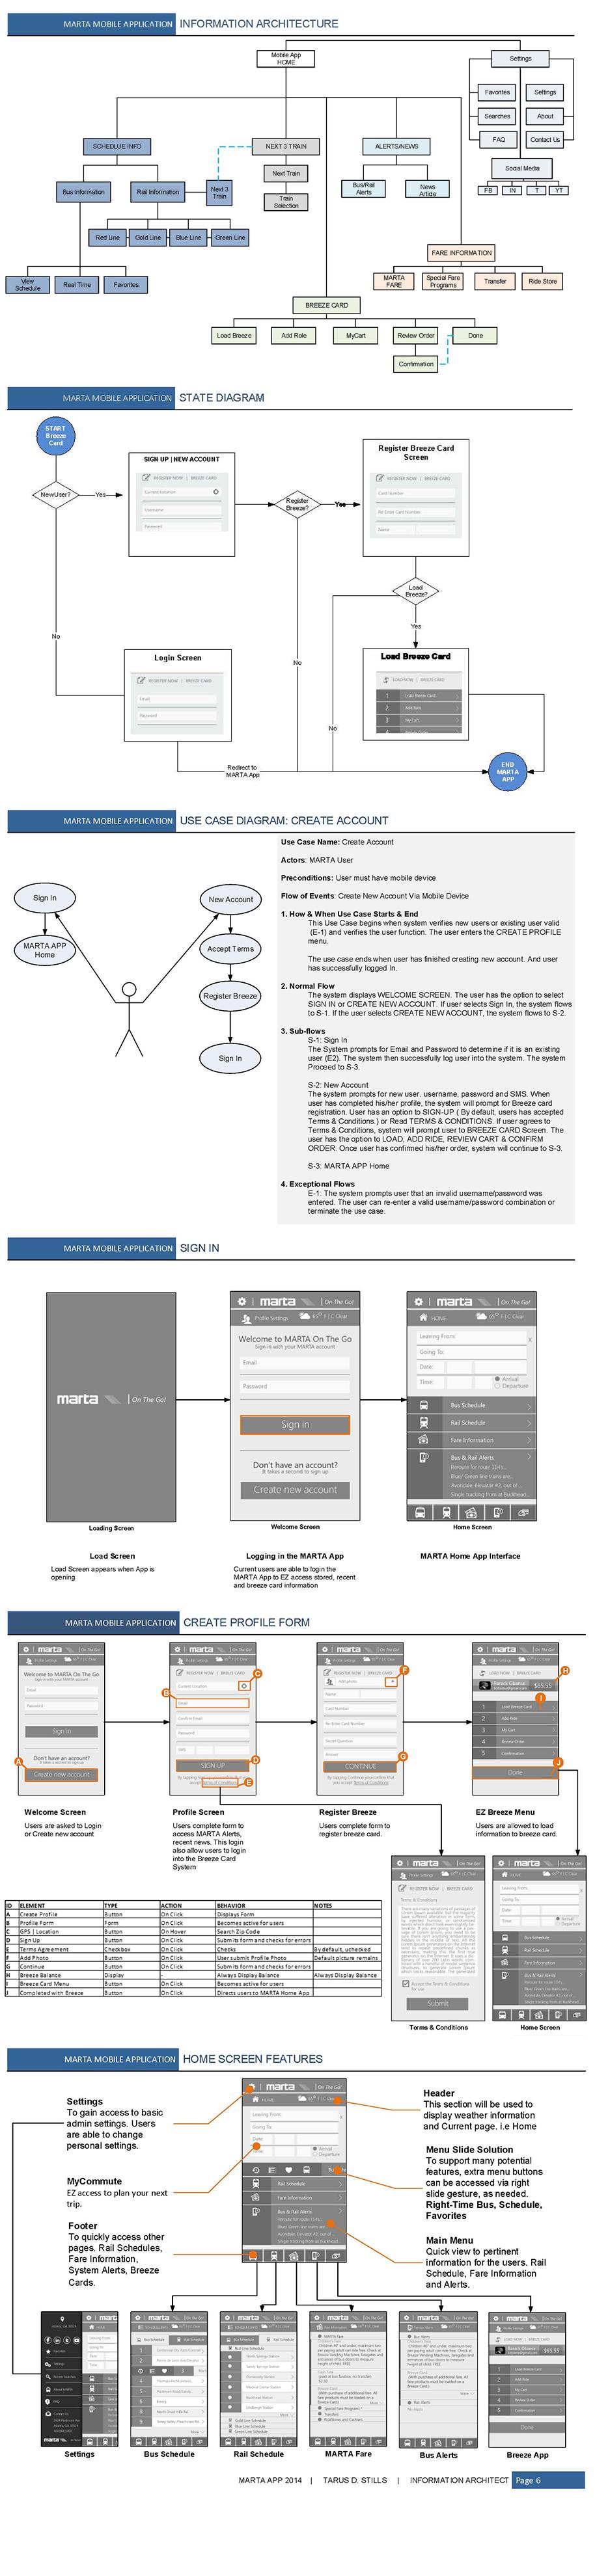 Interaction-Design_NewPortfoliot_Layout.jpg